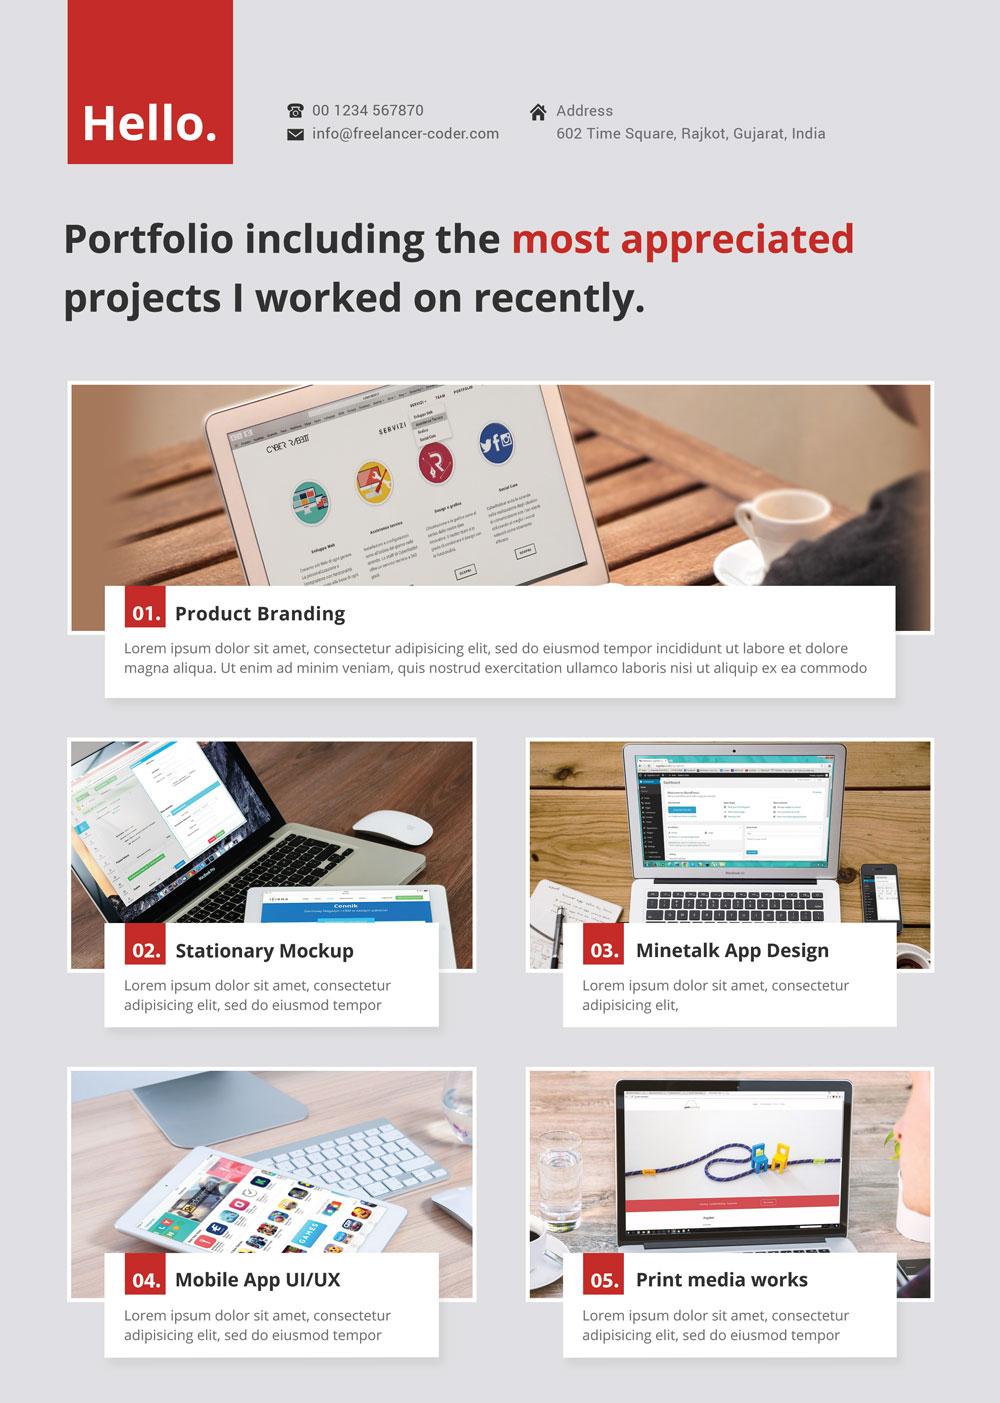 Free-Modern-Resume-Template-Cover-Letter-&-Portfolio-in-PSD-for-Web-Designer-Coder (5)